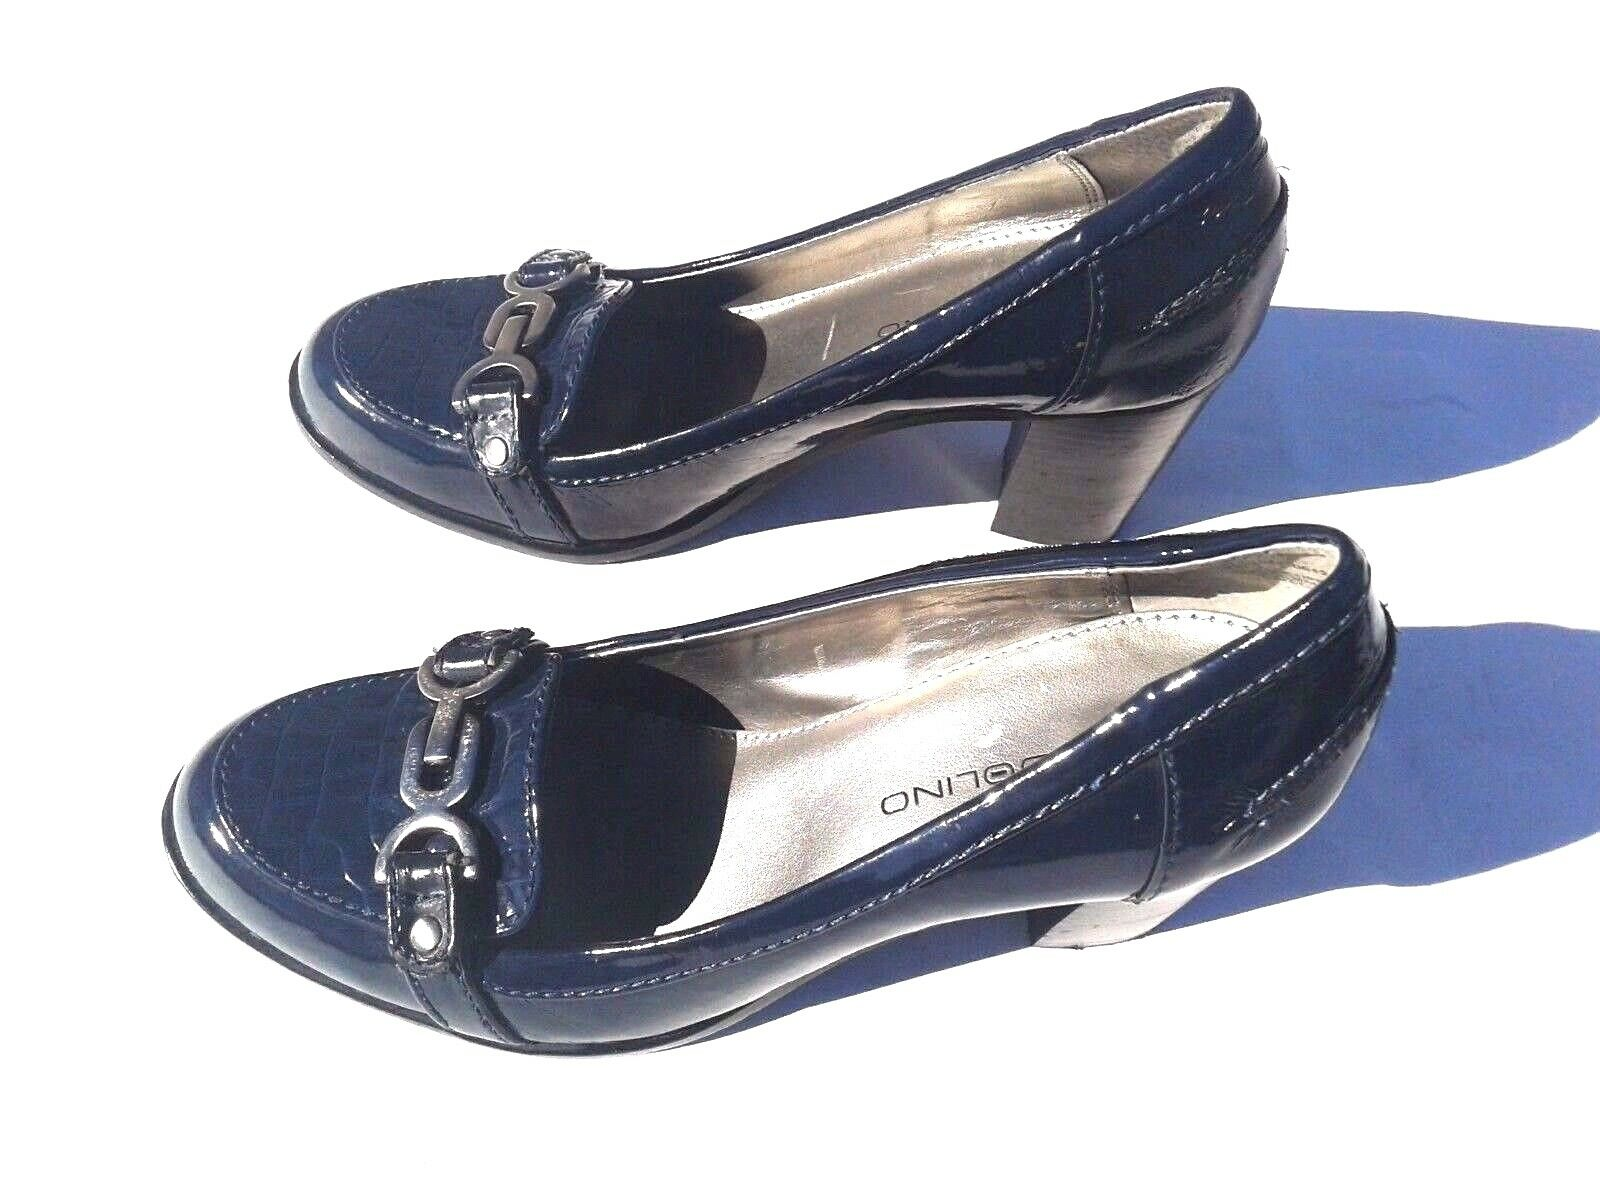 Bandolino Dada Navy bluee Patent Leather Pump shoes Size 7M